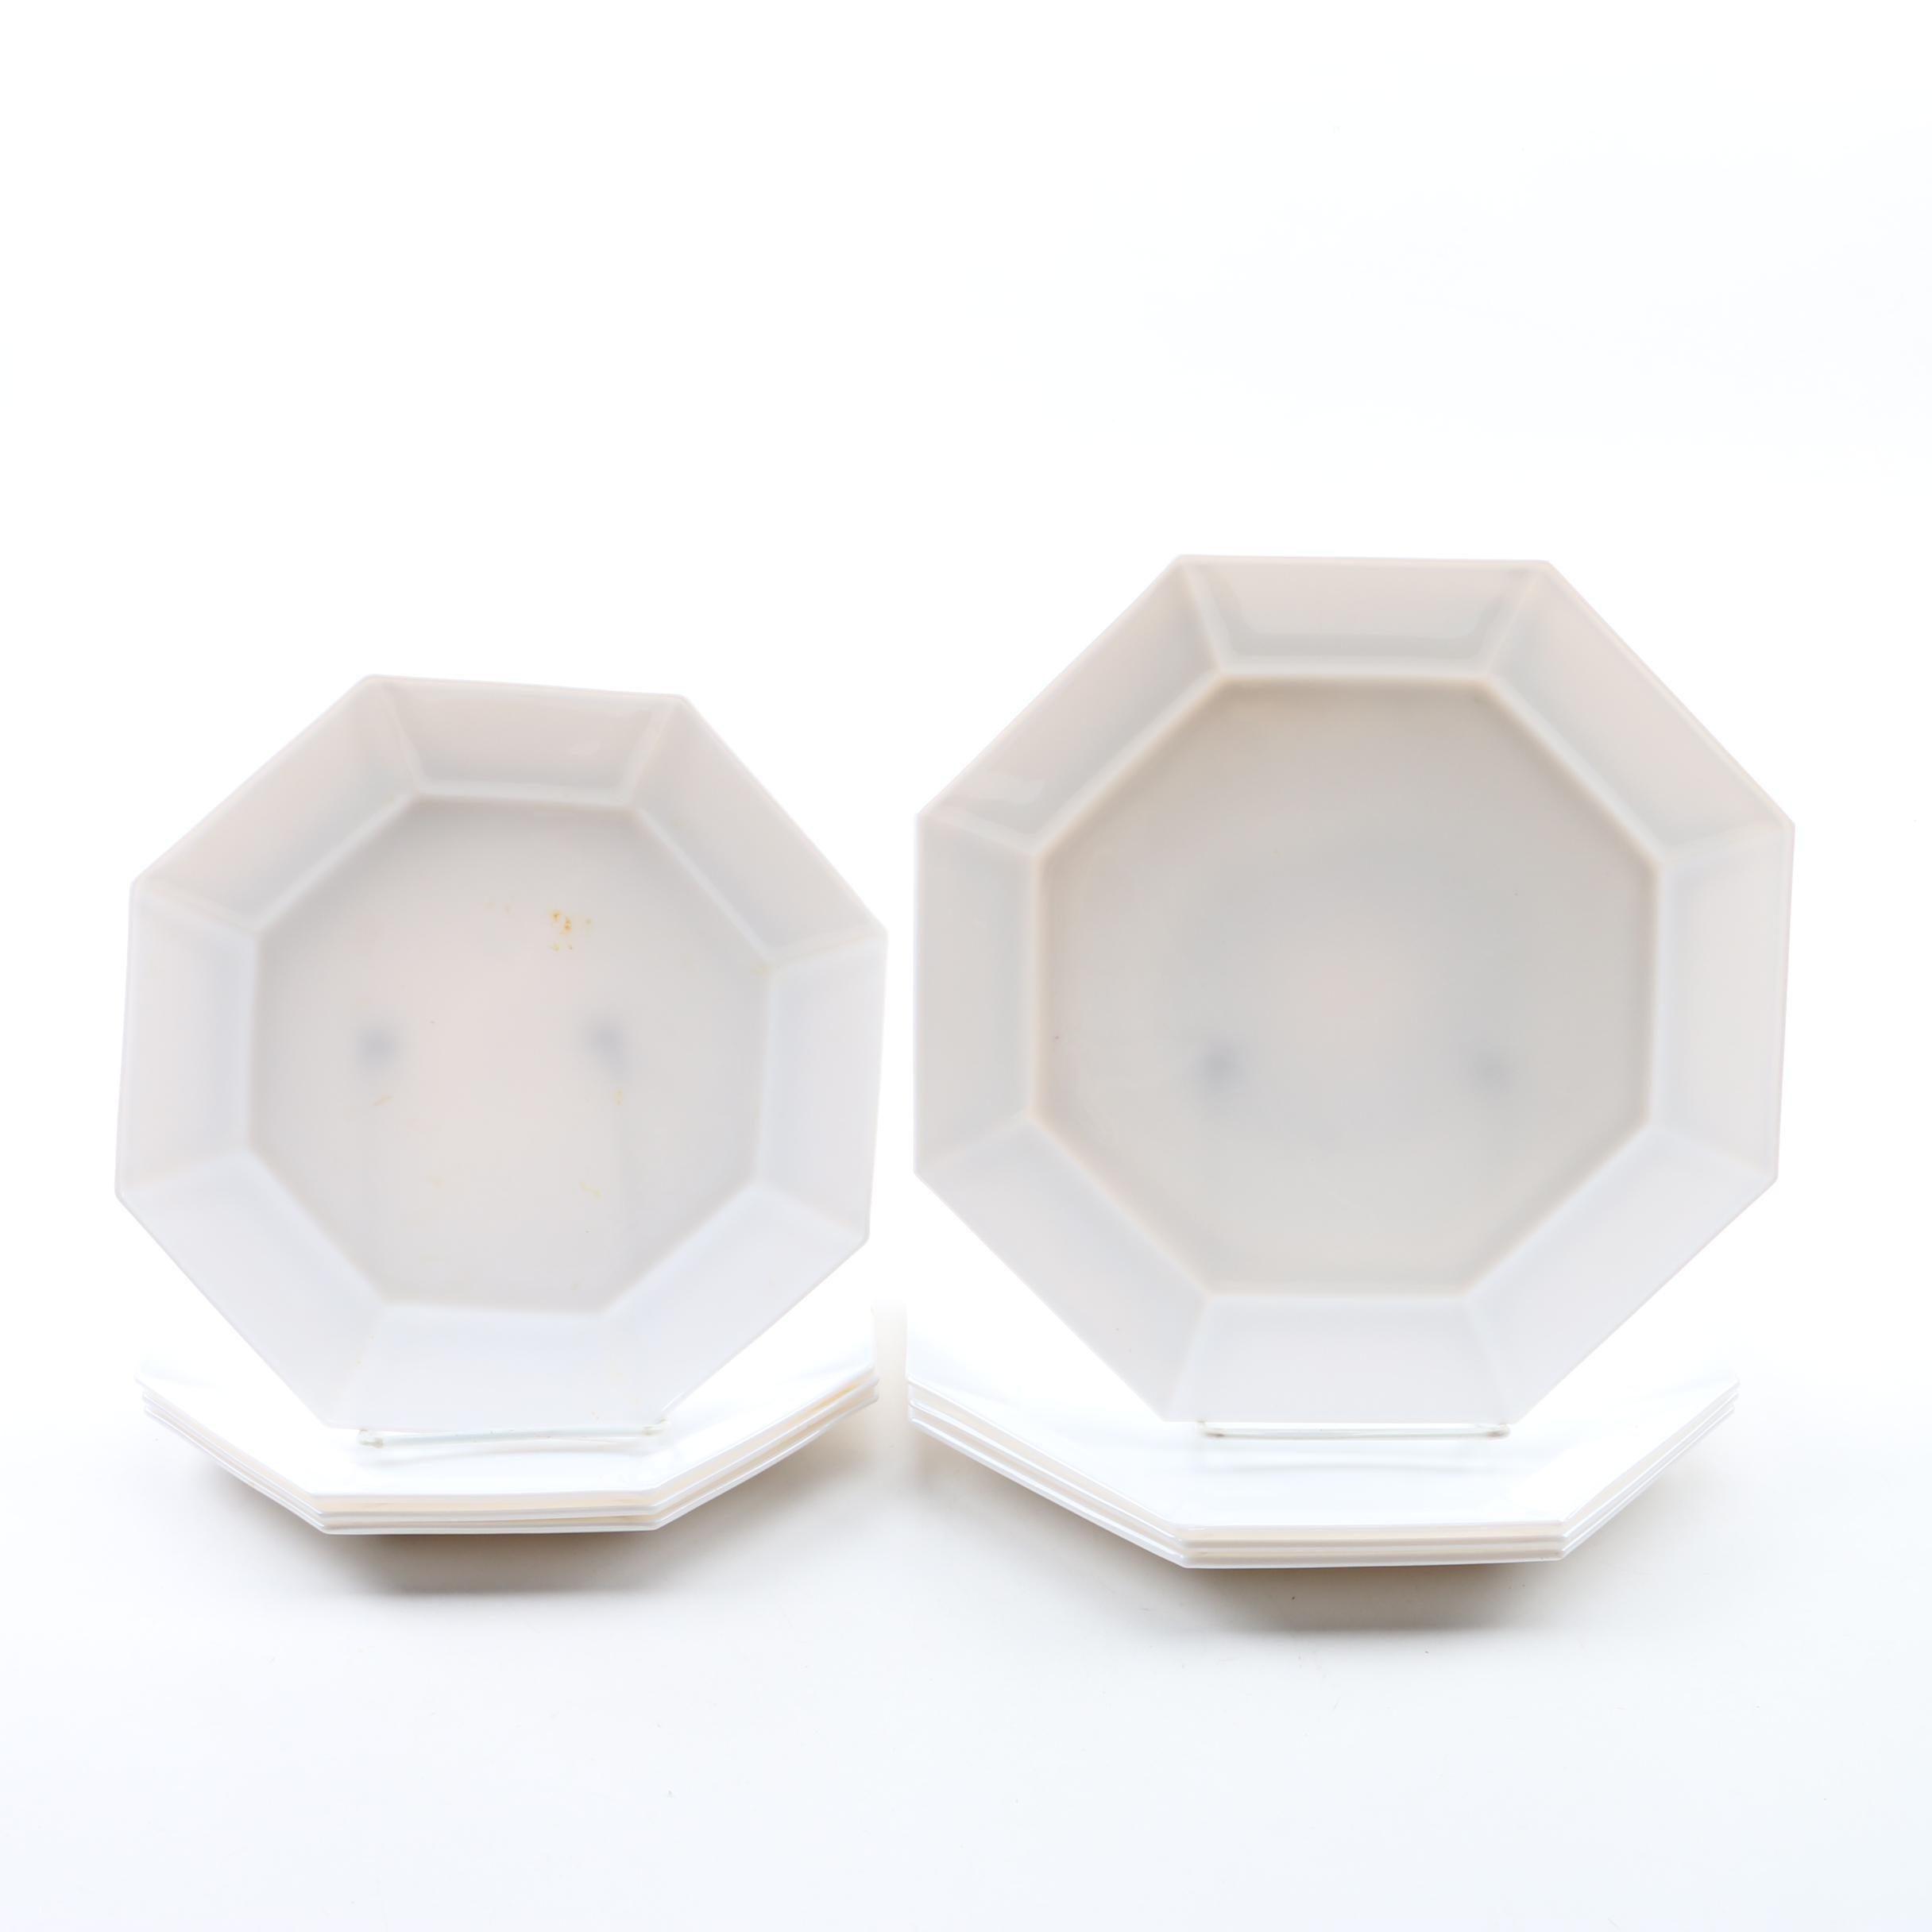 "Vintage Arcopal ""Novoctime White"" Glass Plates"